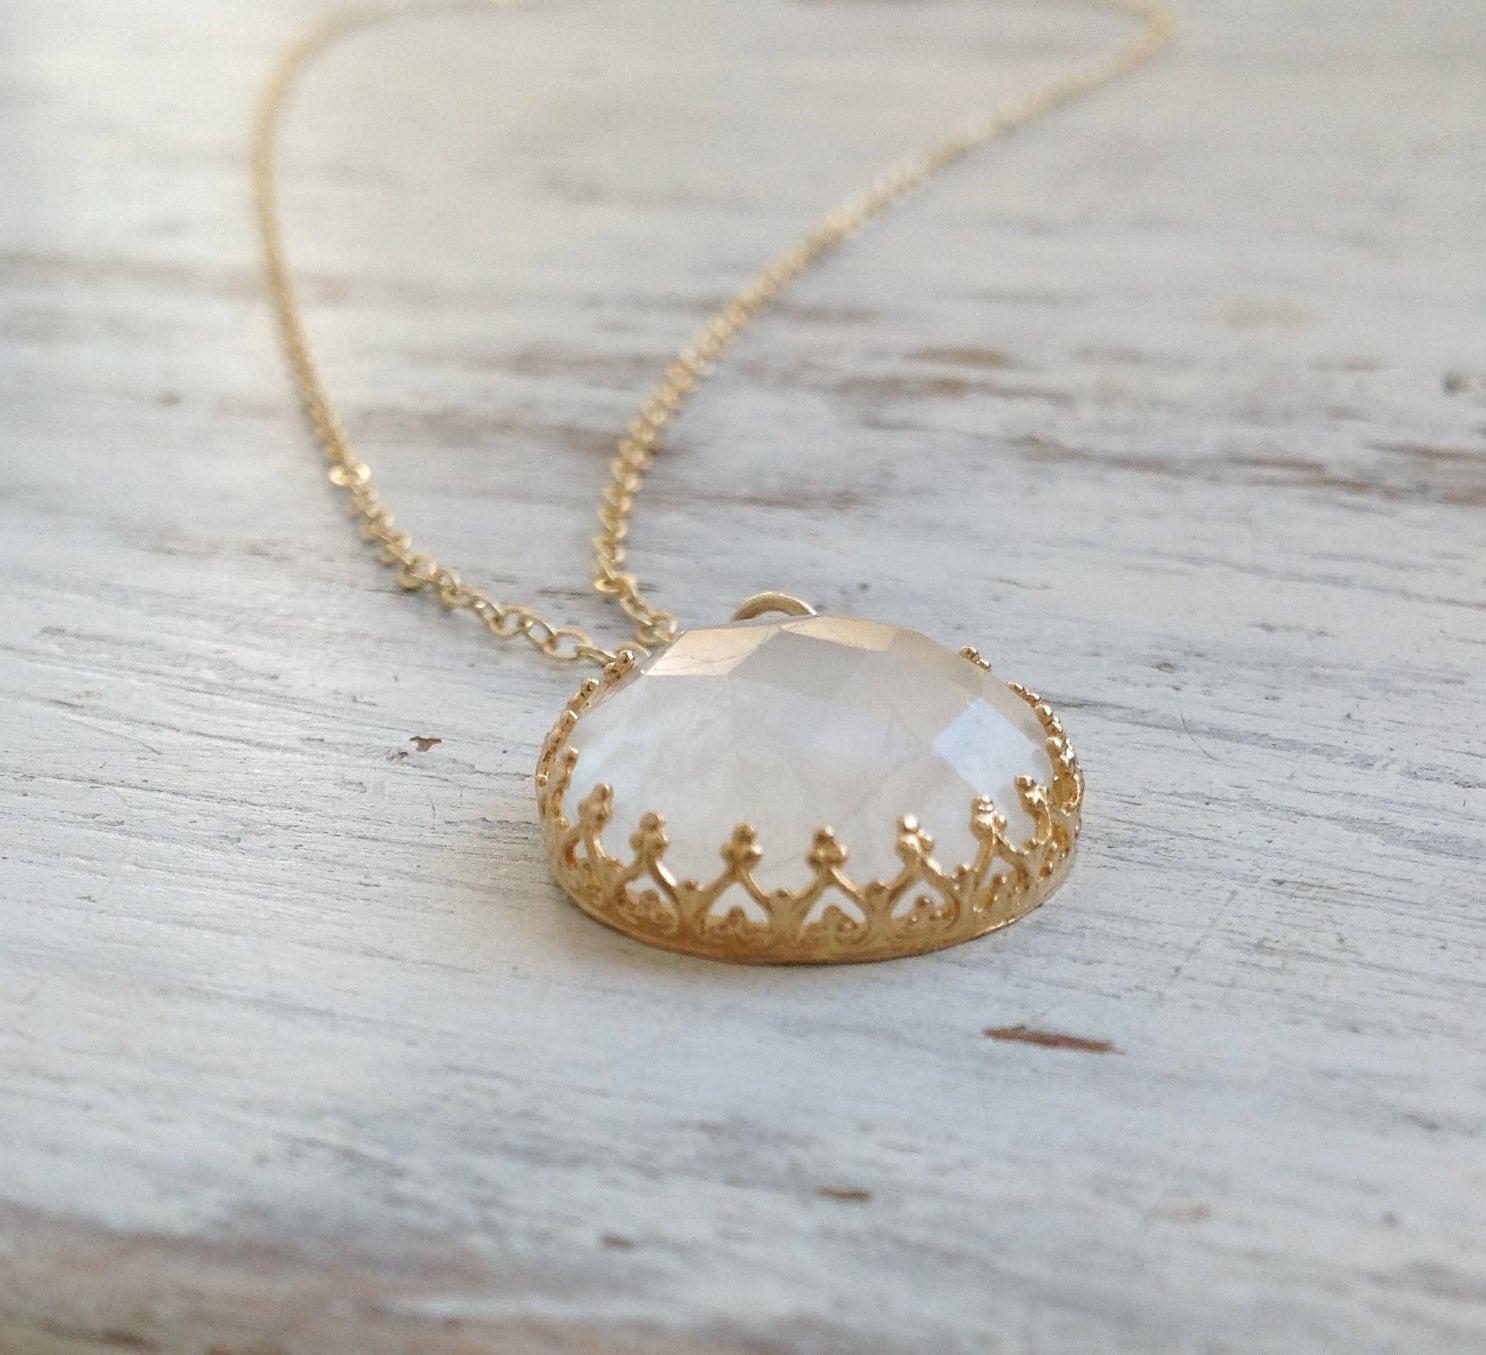 Moonstone Necklace Genuine Moonstone Pendant Necklace